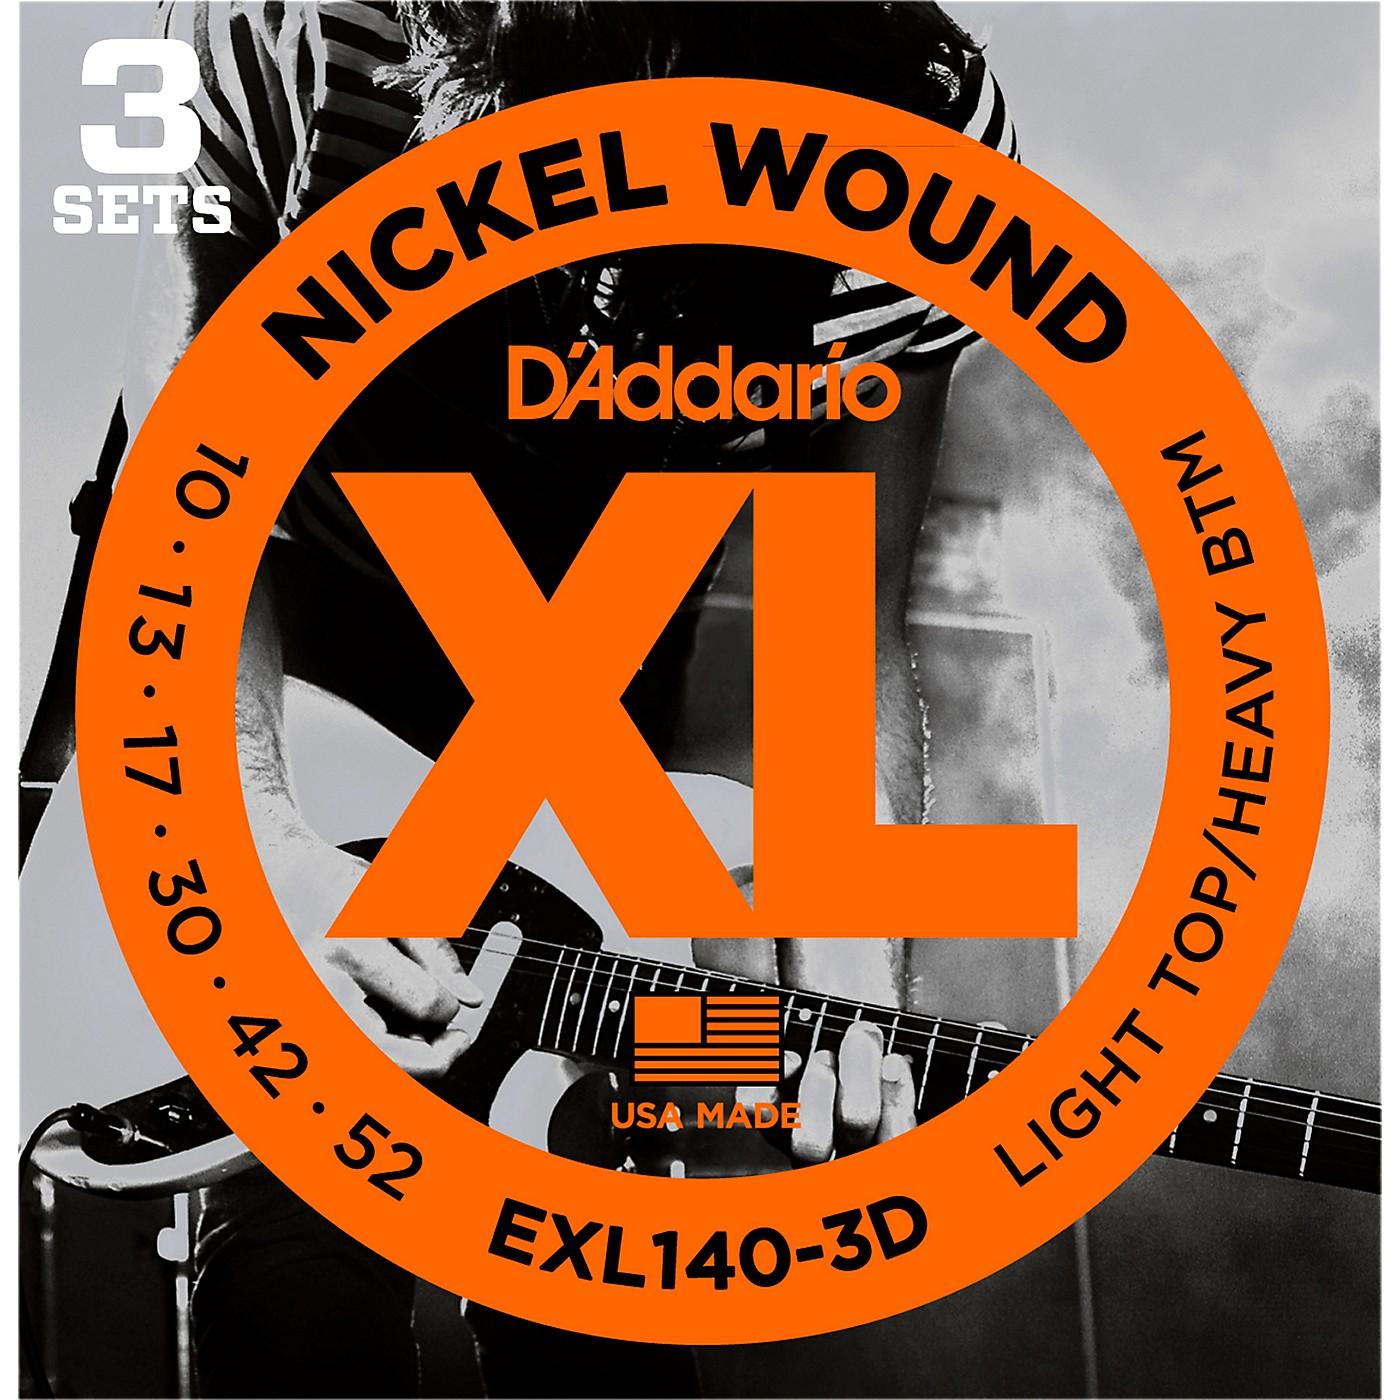 D'Addario EXL140 Light Top/Heavy Bottom Electric Guitar Strings 3-Pack thumbnail